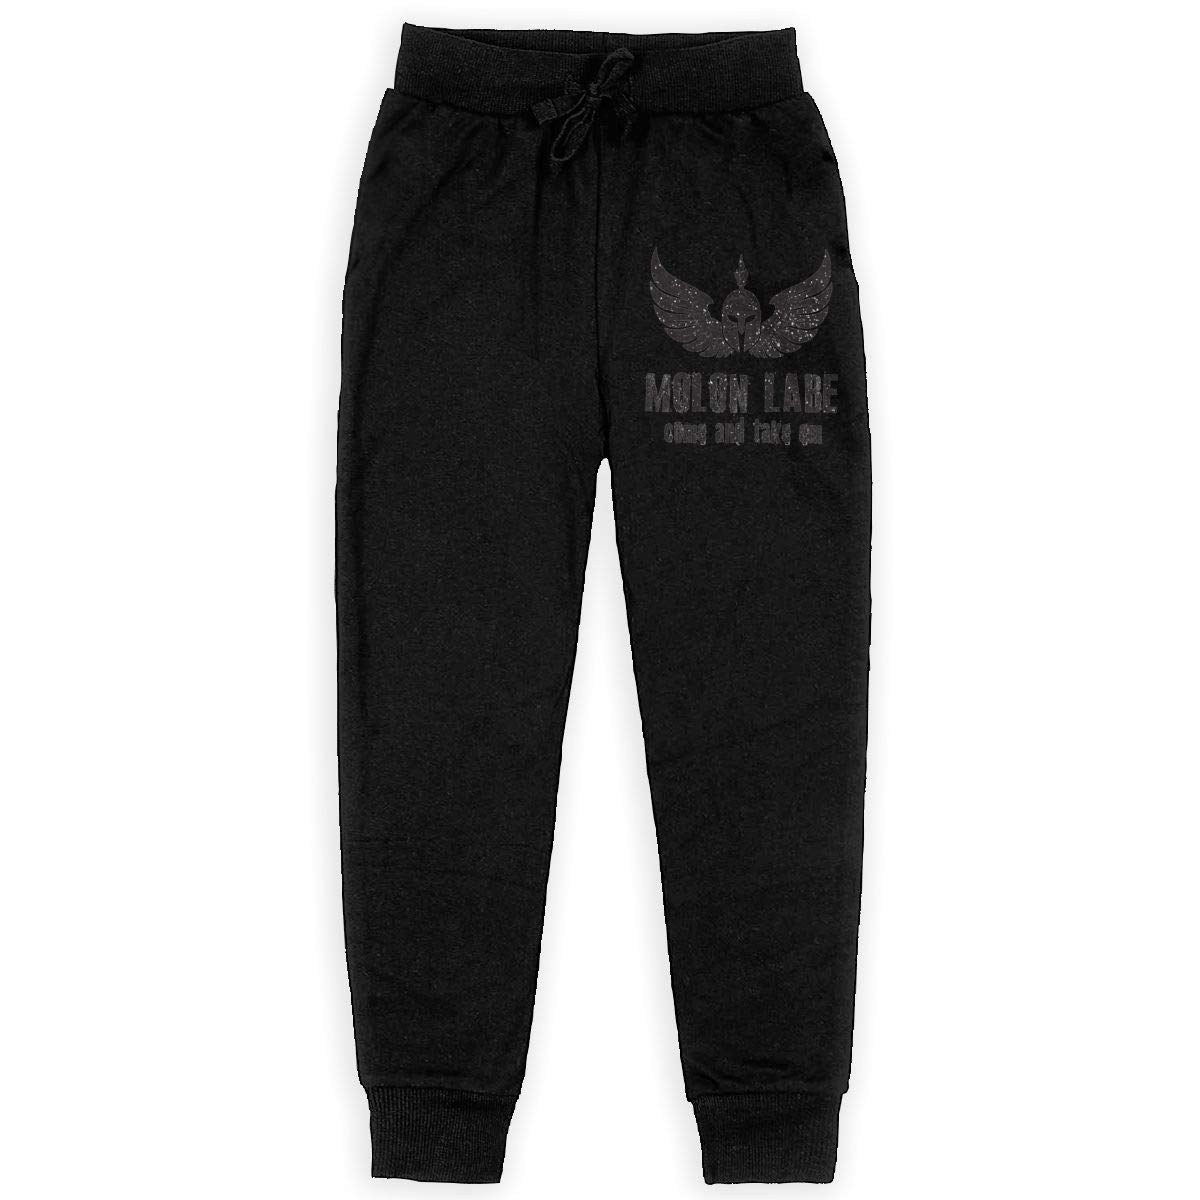 Dunpaiaa Come and Take Them Molon Labe Logo Boys Sweatpants,Joggers Sport Training Pants Trousers Black